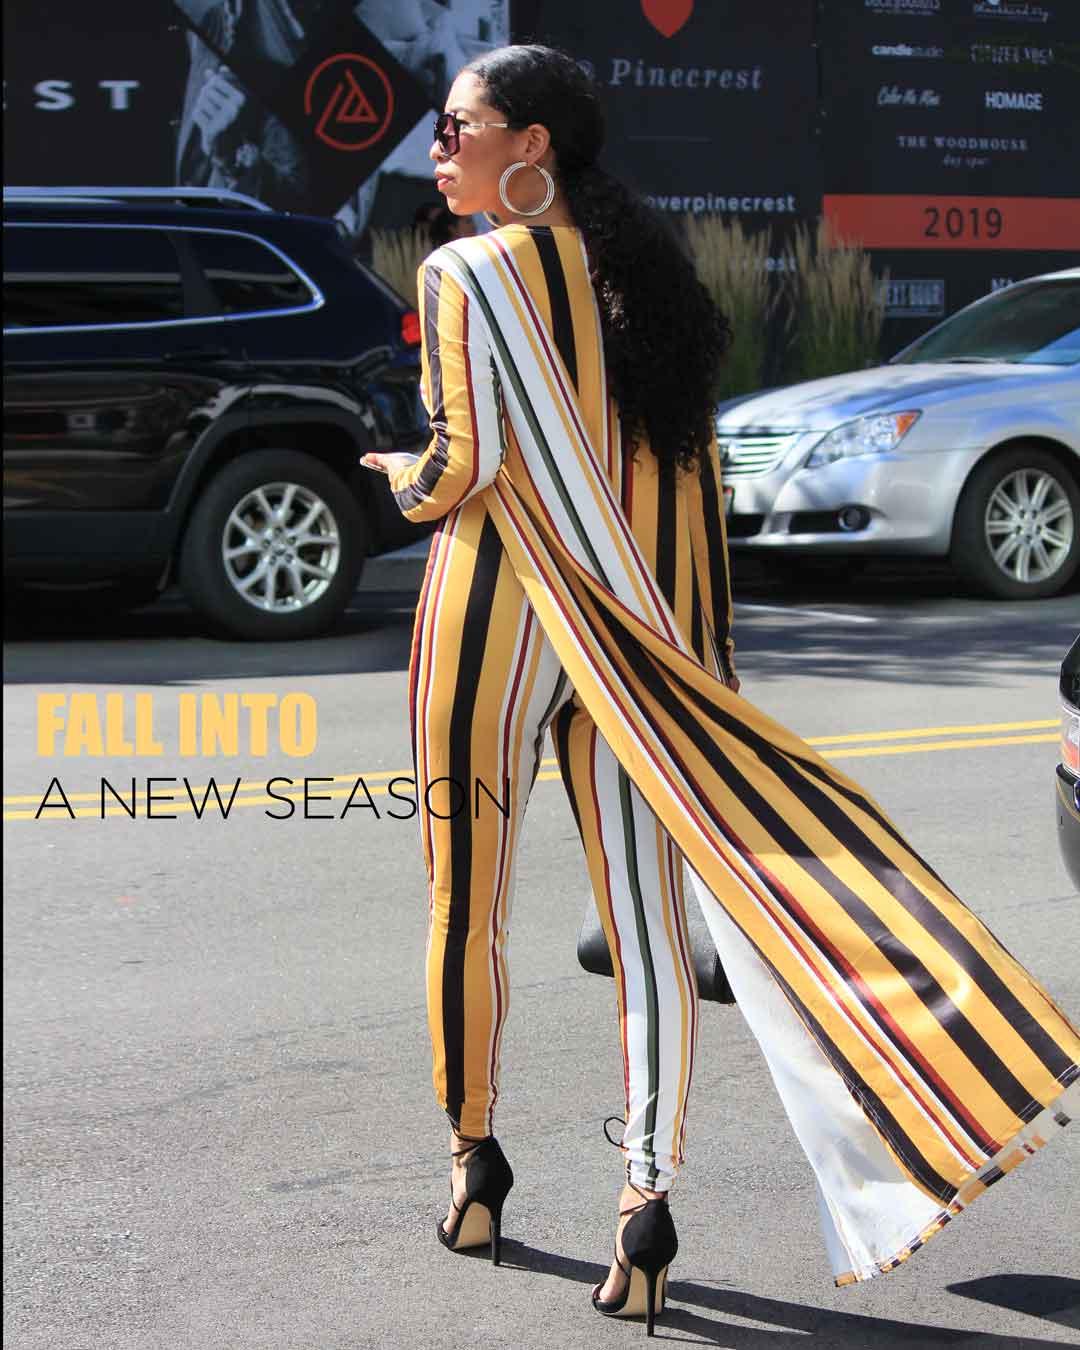 Fall into a new season at Donnards.com